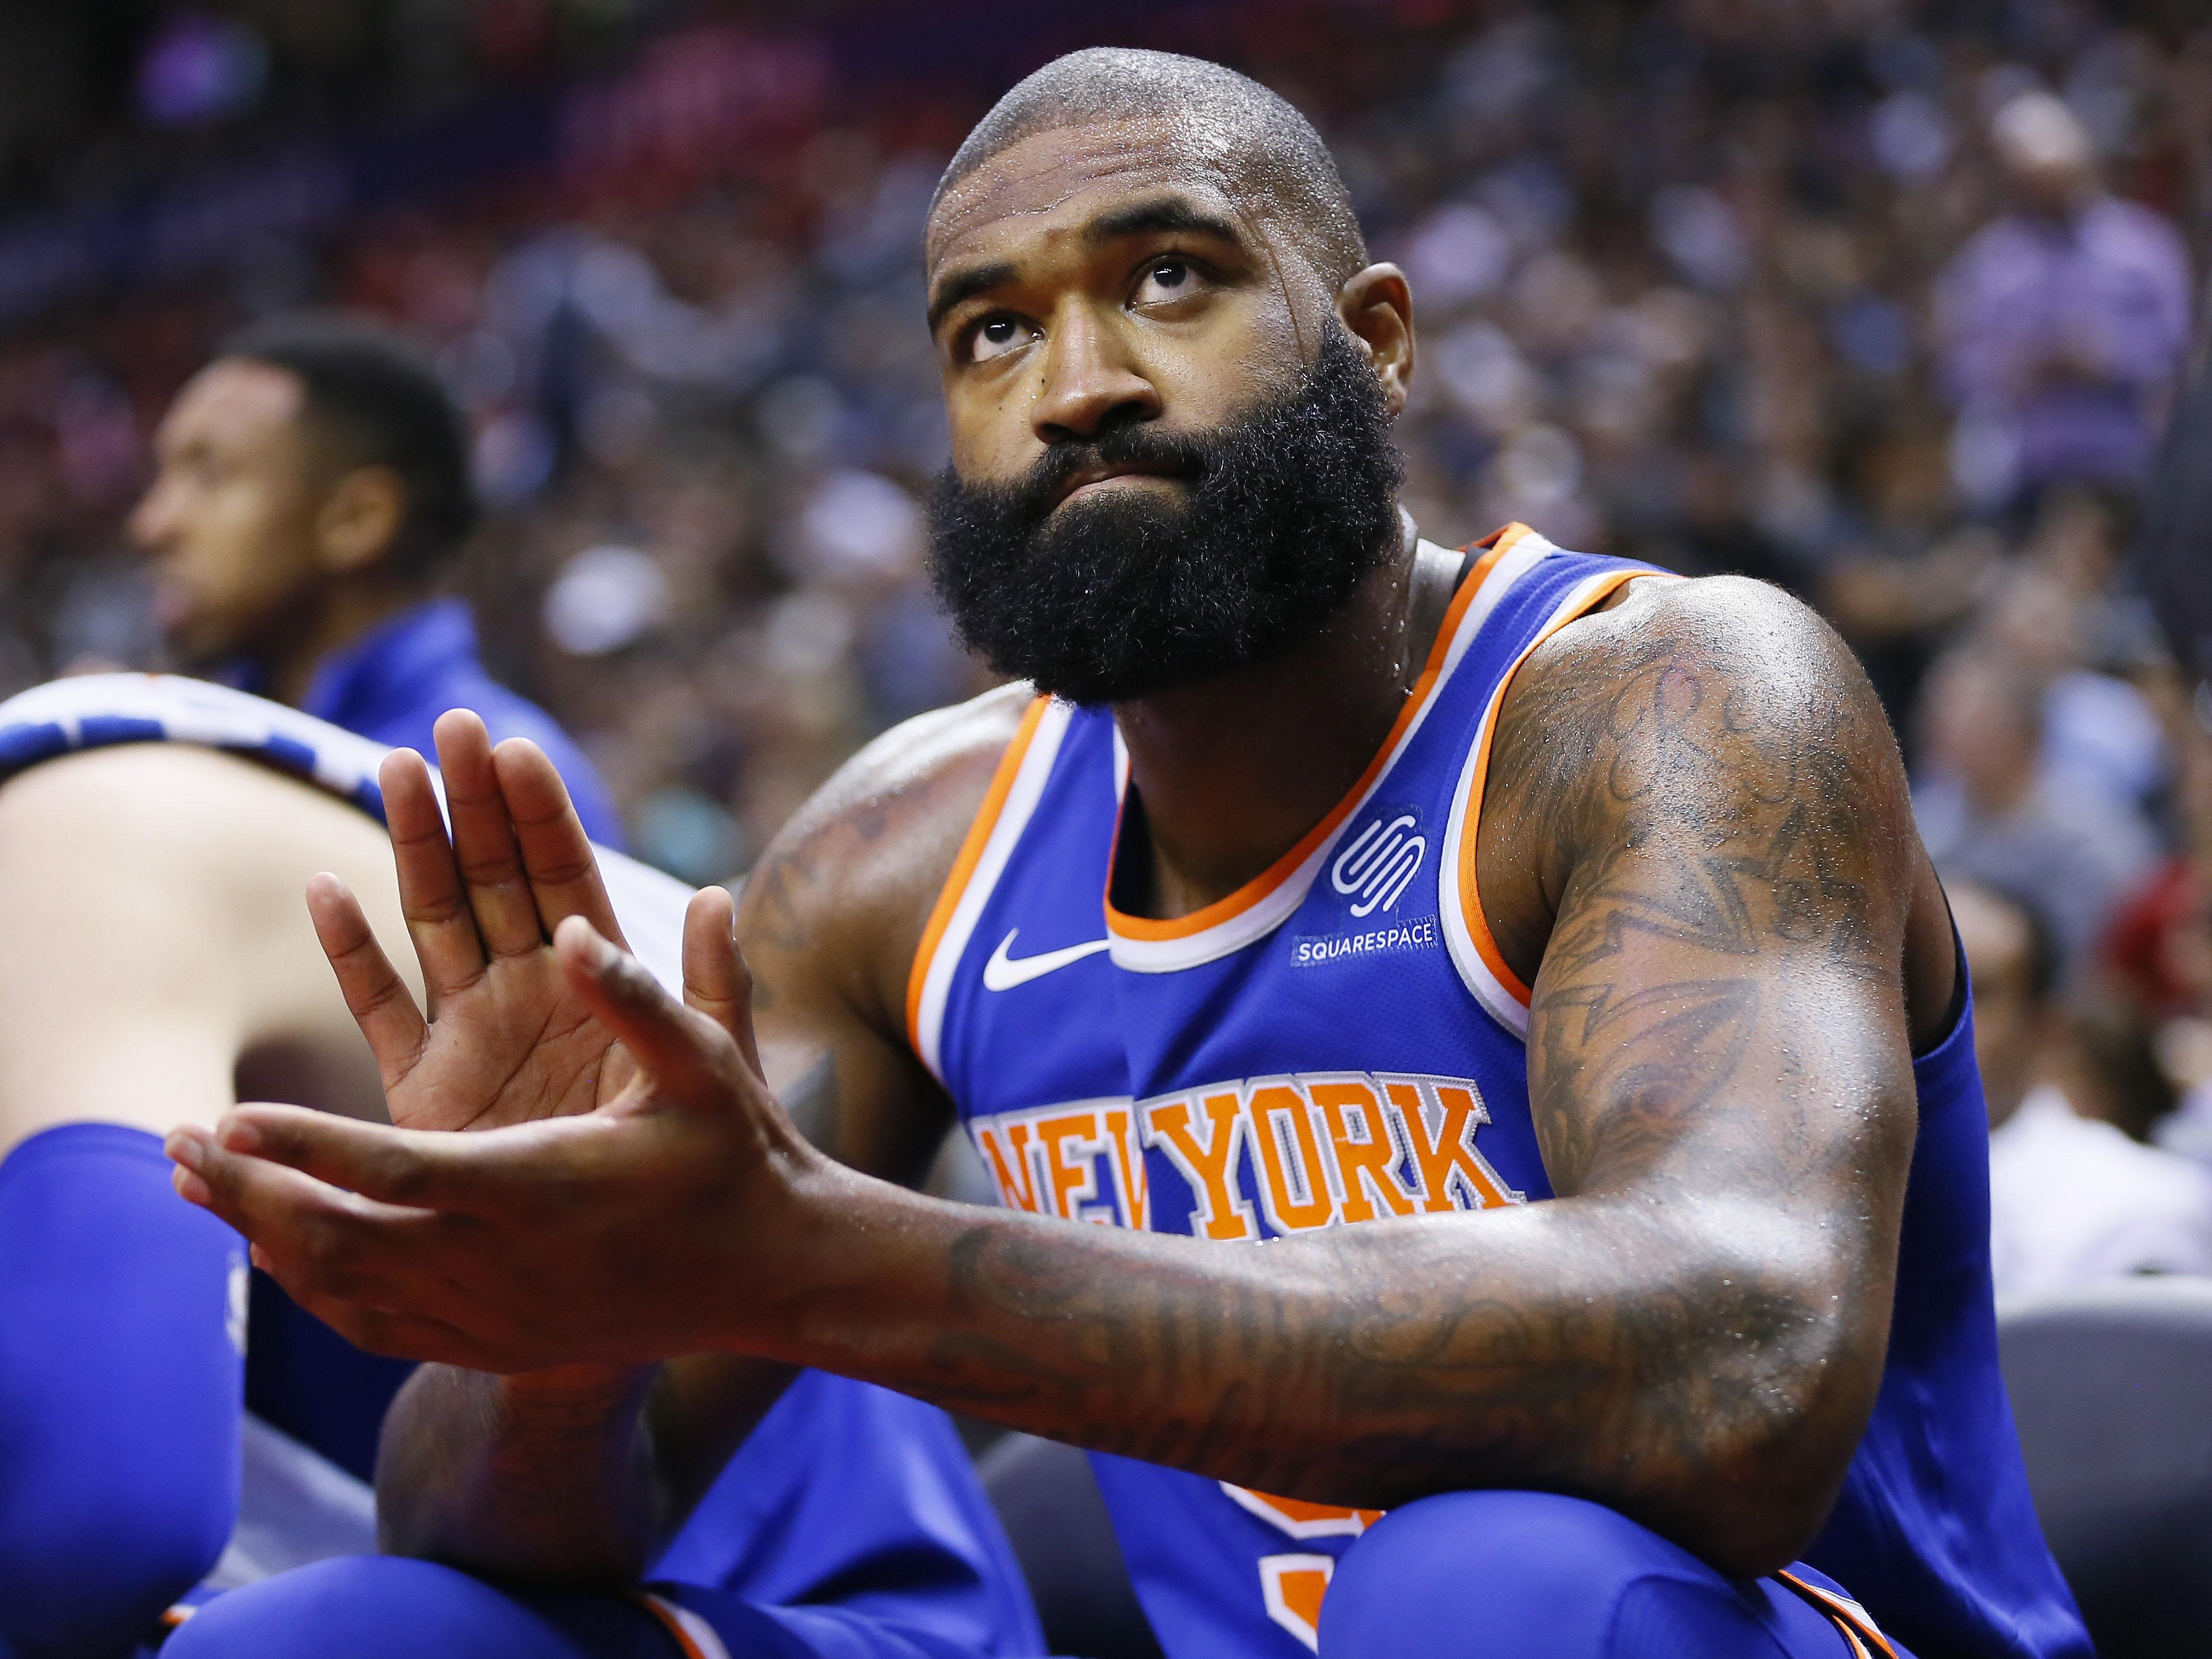 Jarrett Jack and Kyle O'Quinn Play Unsung Heroes, Lift Knicks Over Mavericks